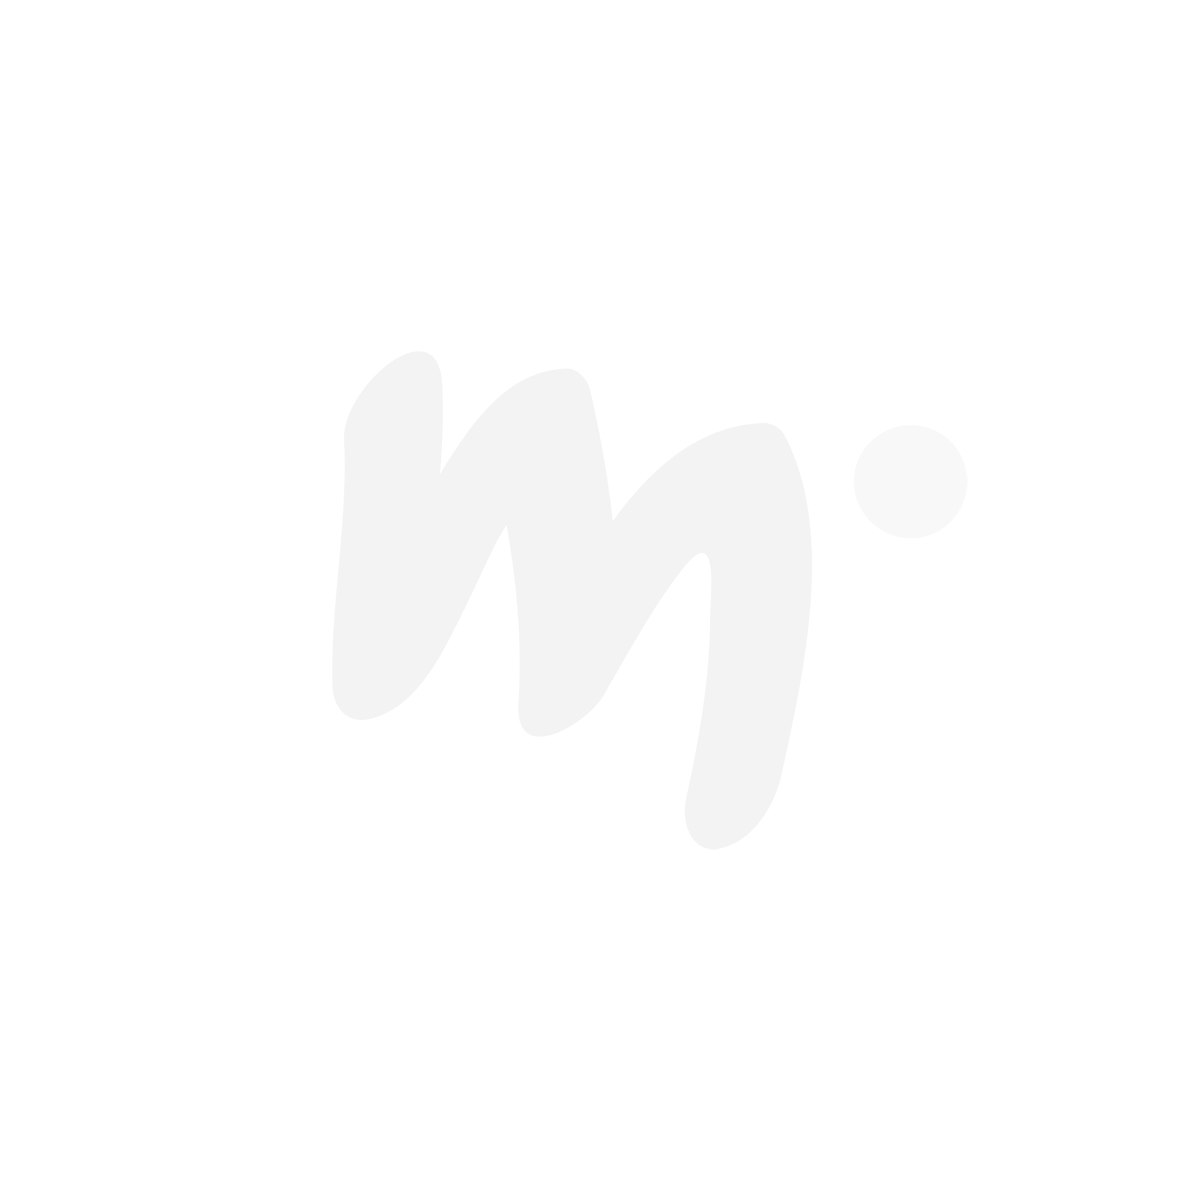 Koti Ornamentti-murokulho harmaa 4 kpl